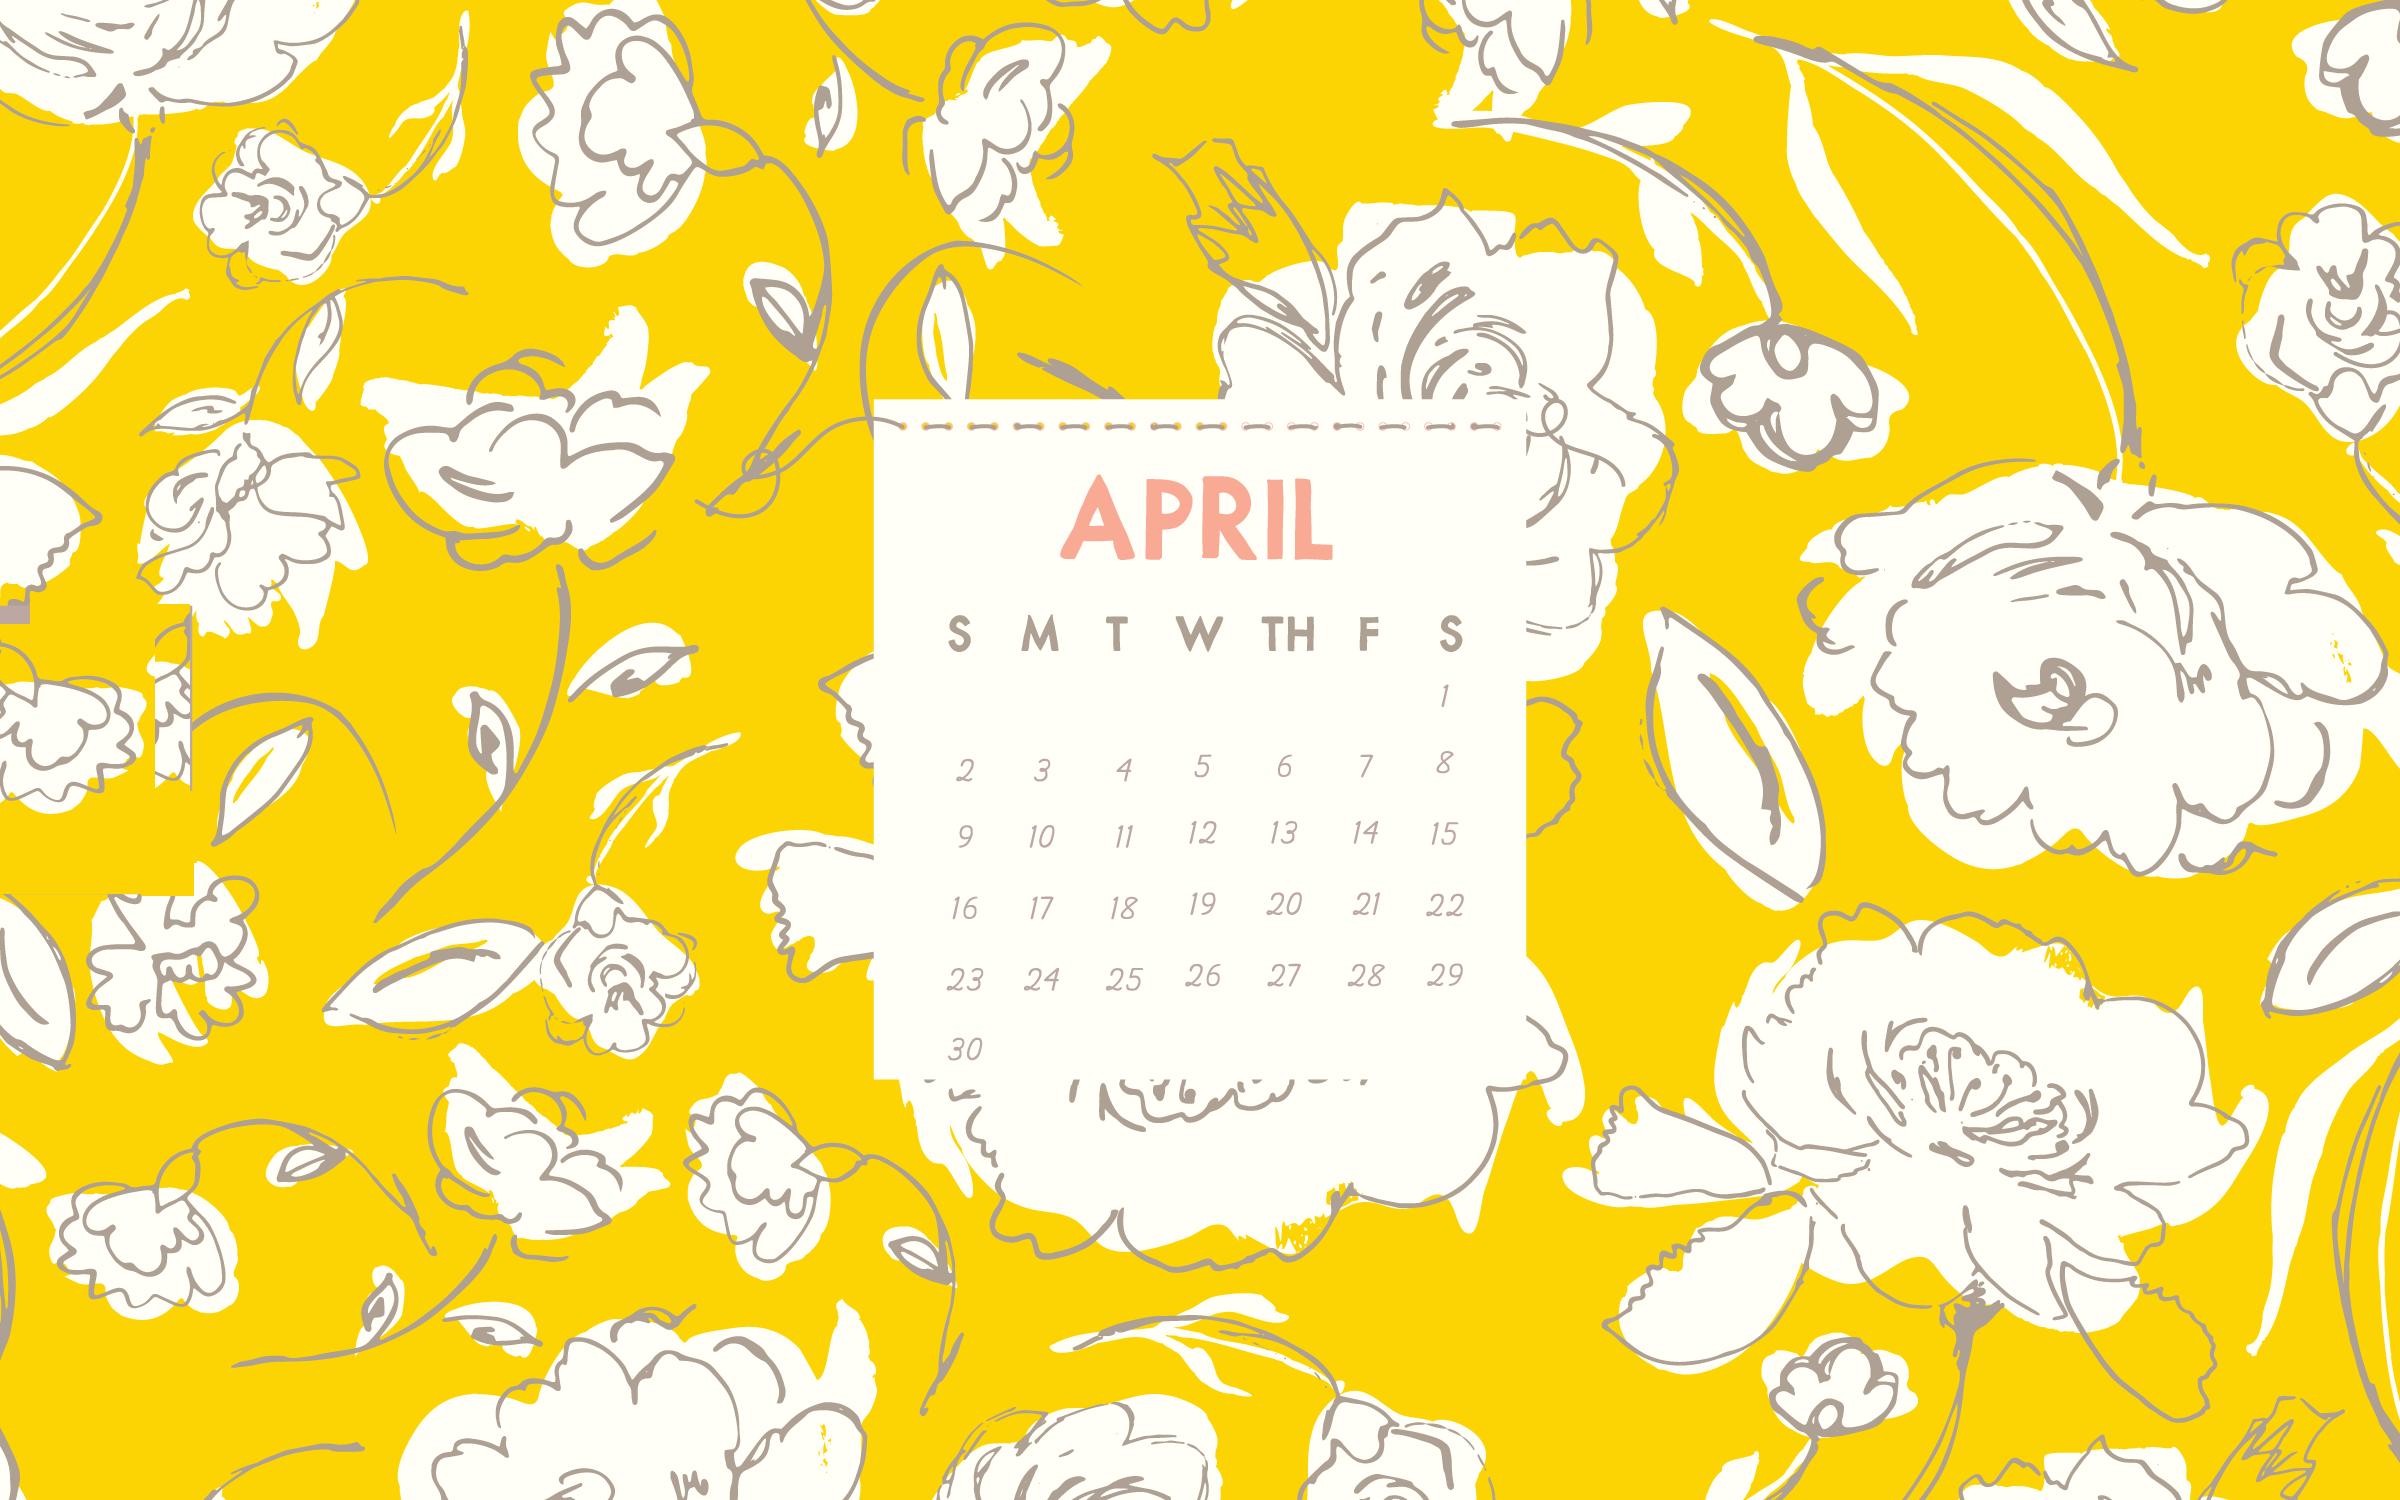 April 2018 Desktop Background Calendar Calendar 2018 Desktop 2400x1500